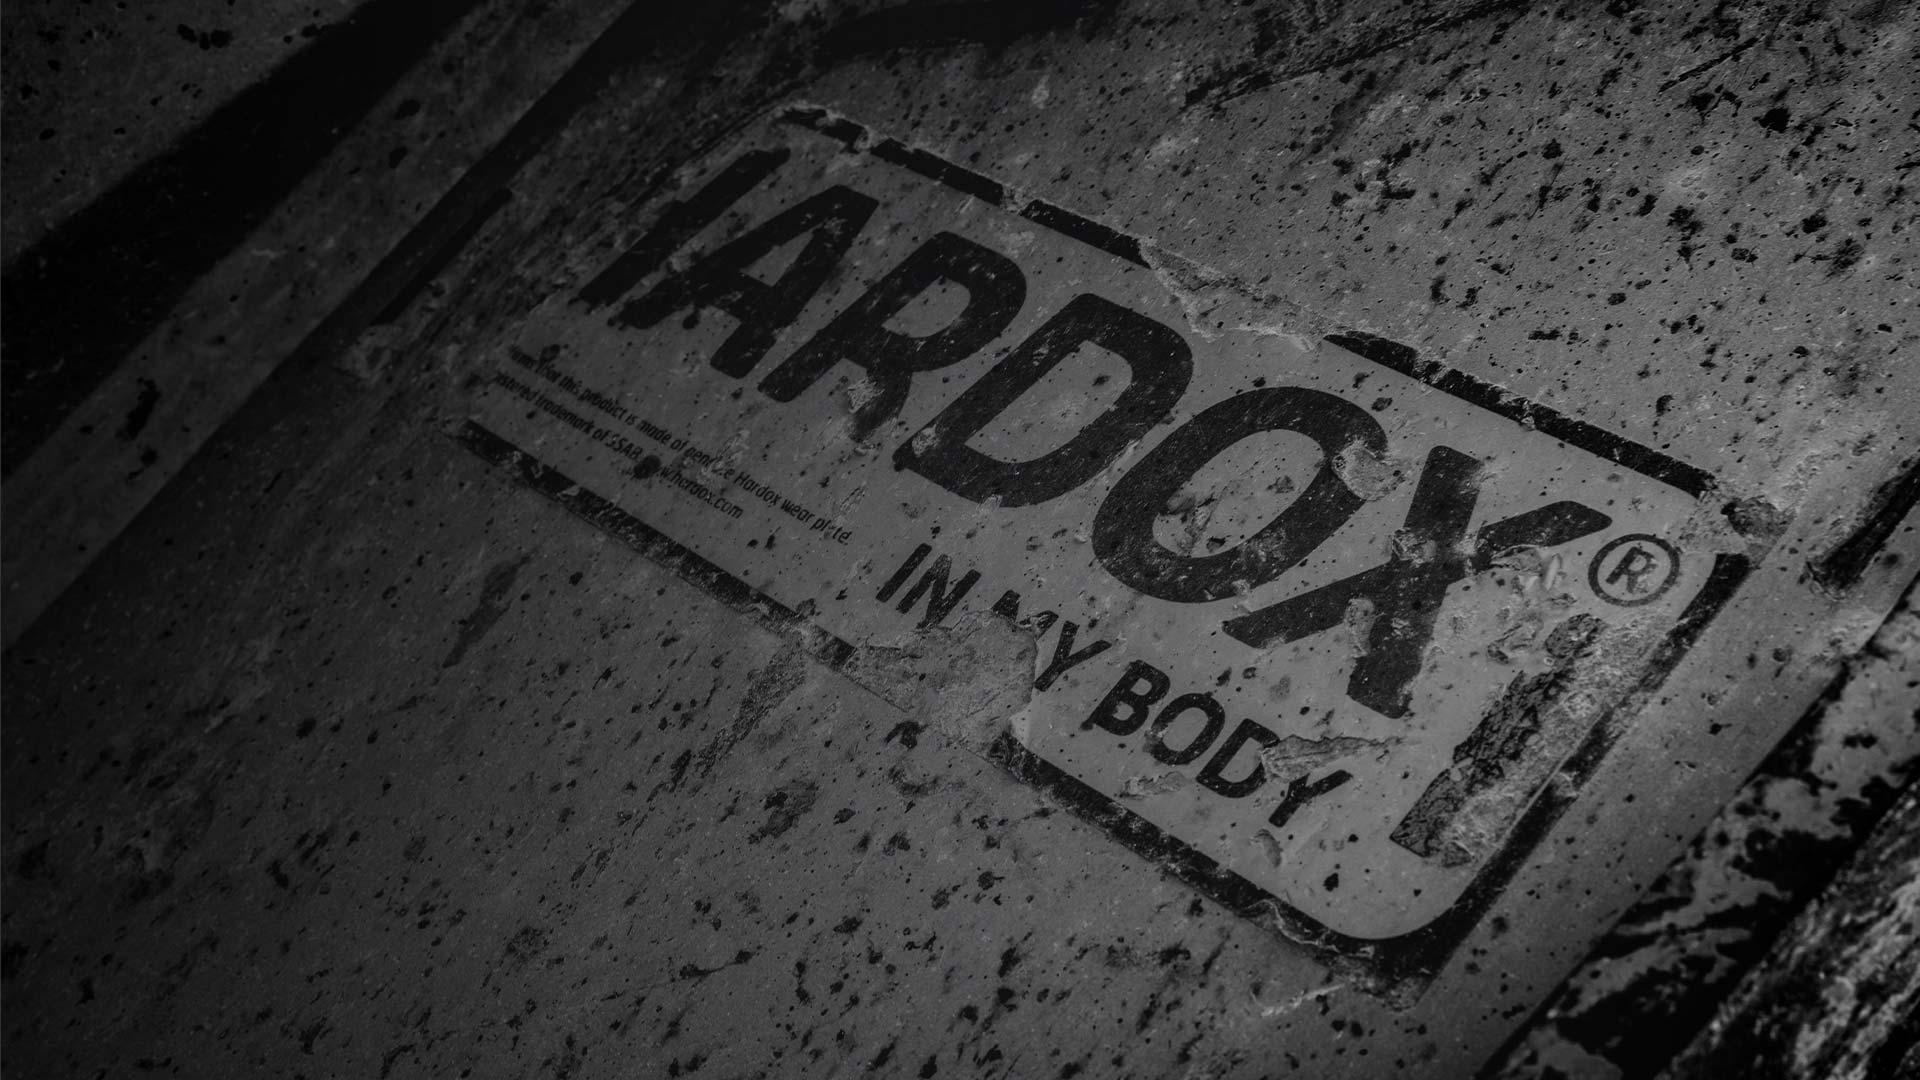 Hardox In My Body jelölés